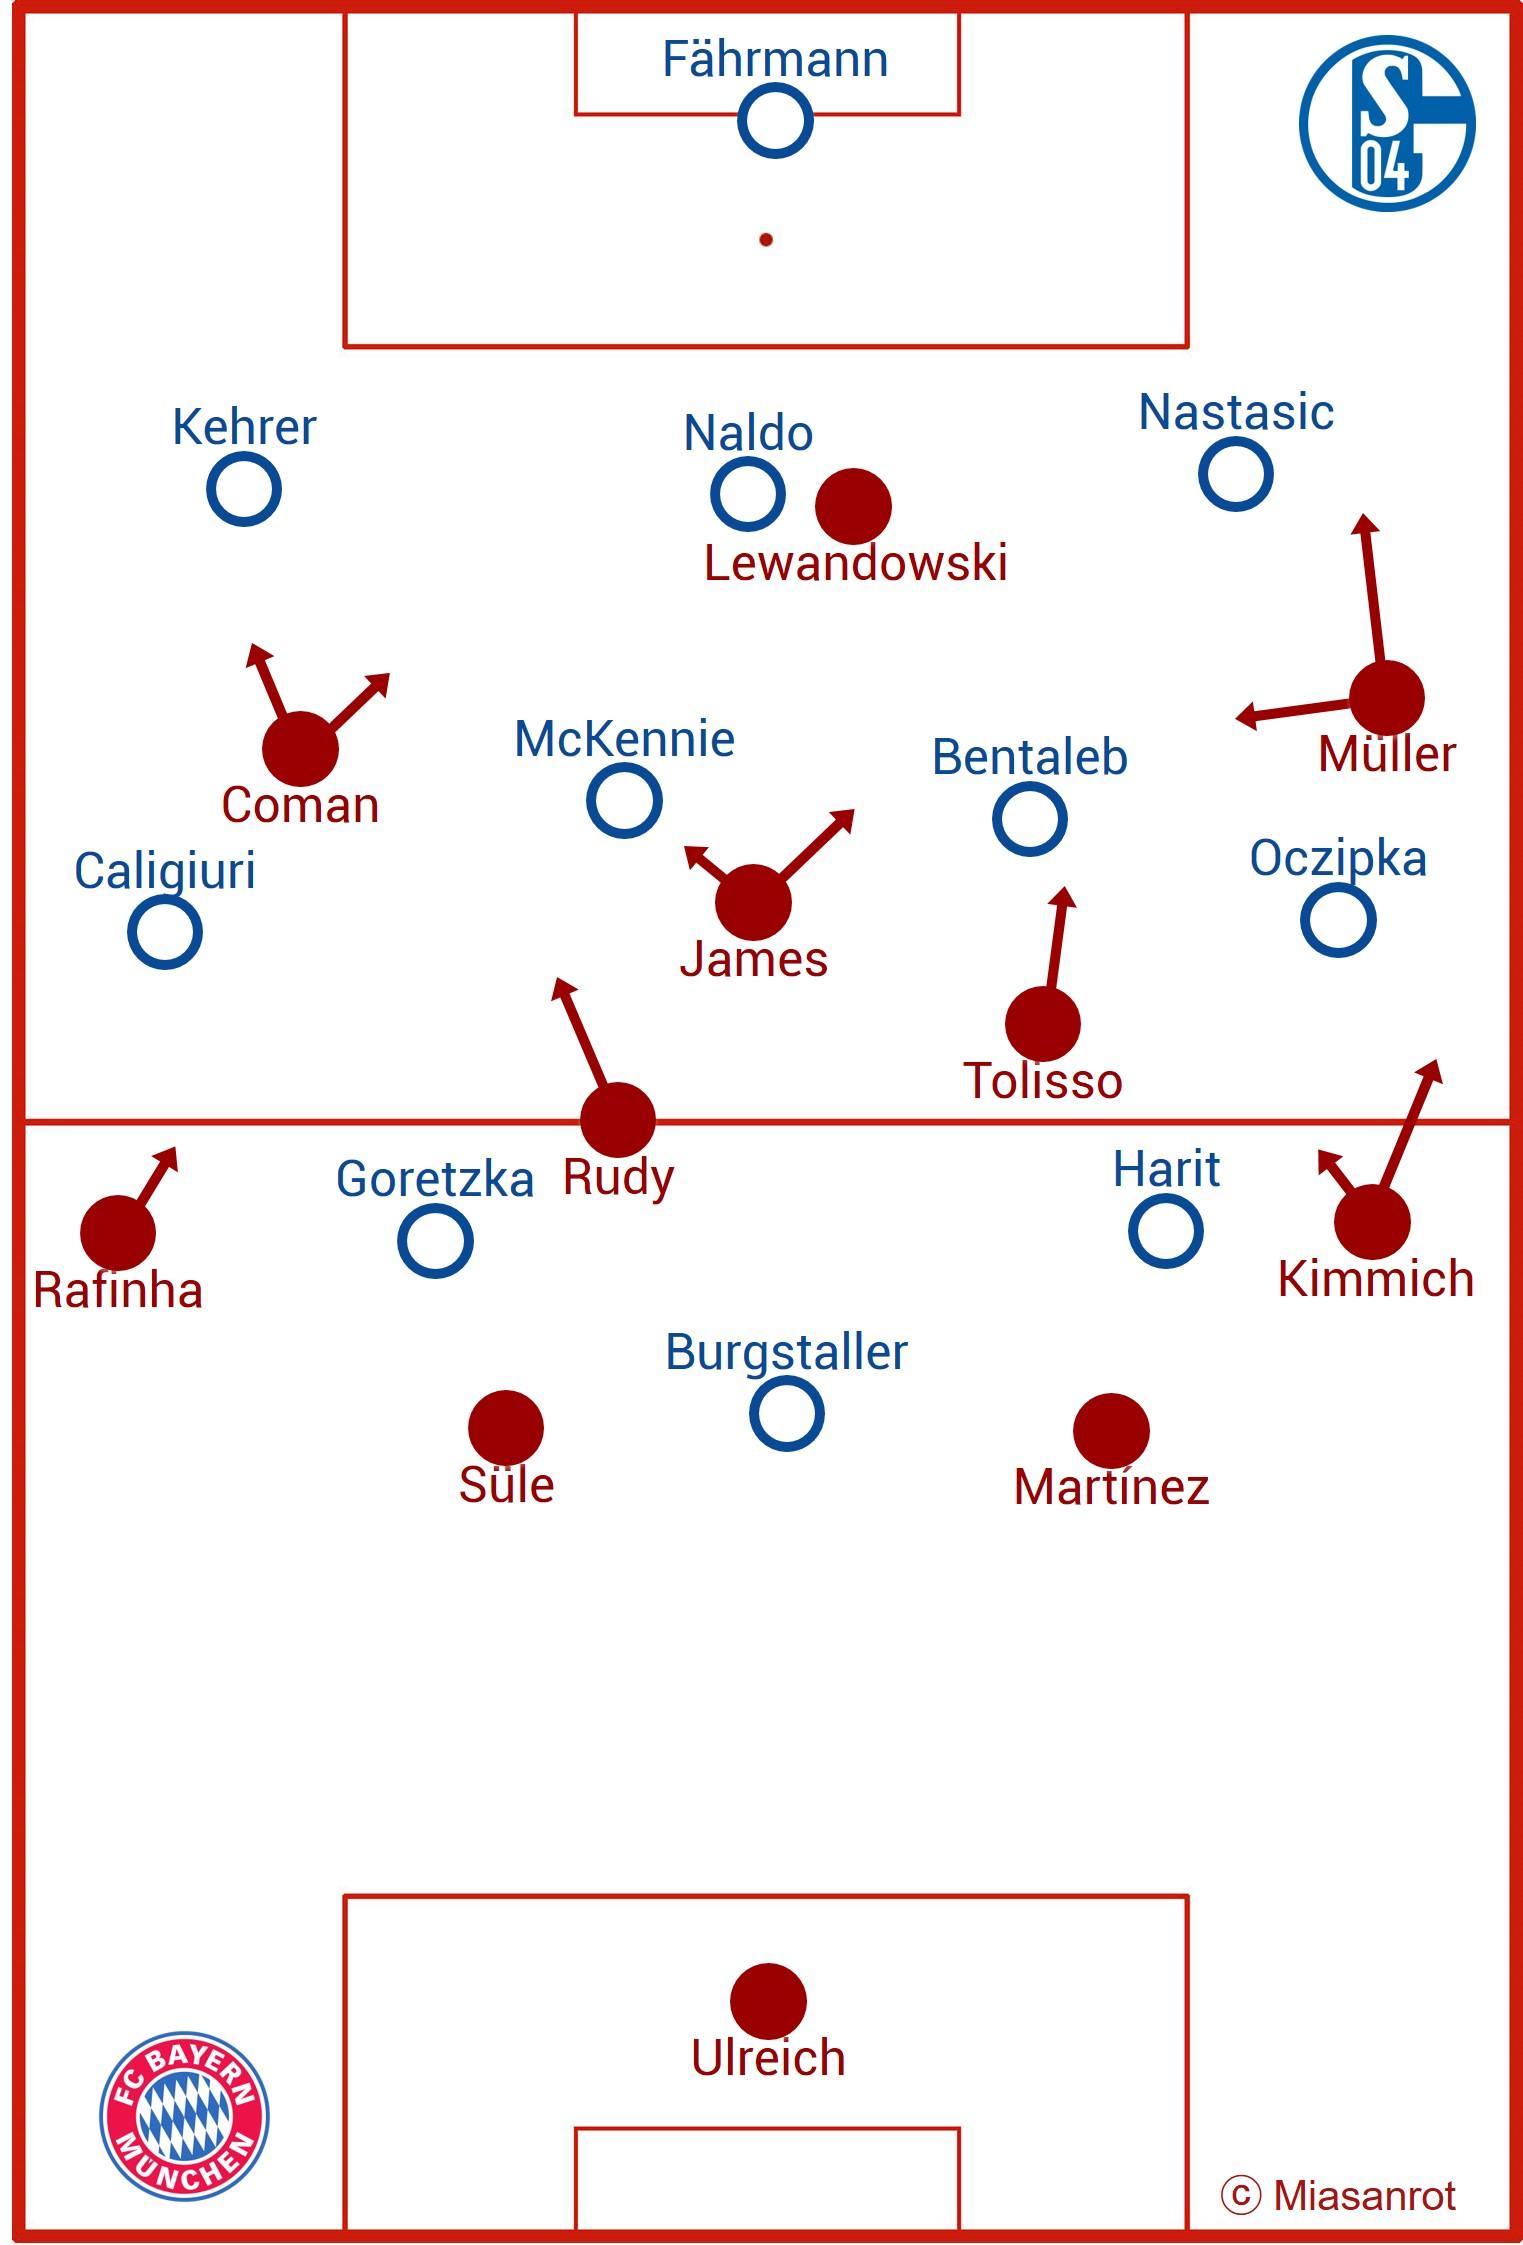 FC Schalke 04 vs FC Bayern, basic formations